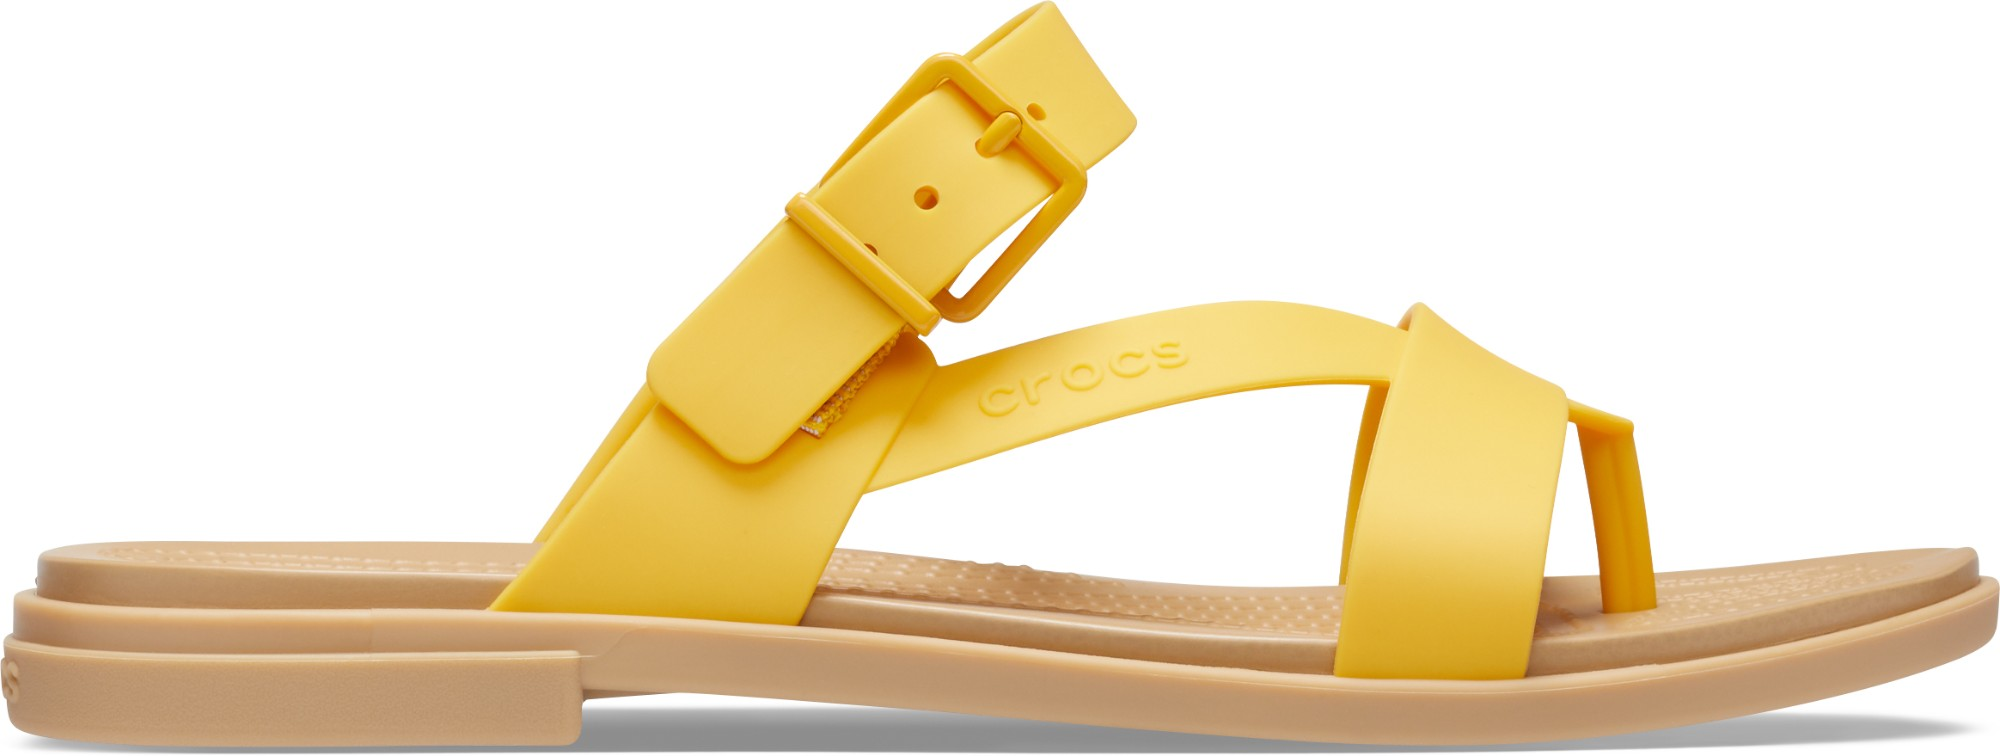 Crocs™ Tulum Toe Post Sandal Womens Canary/Tan 39,5